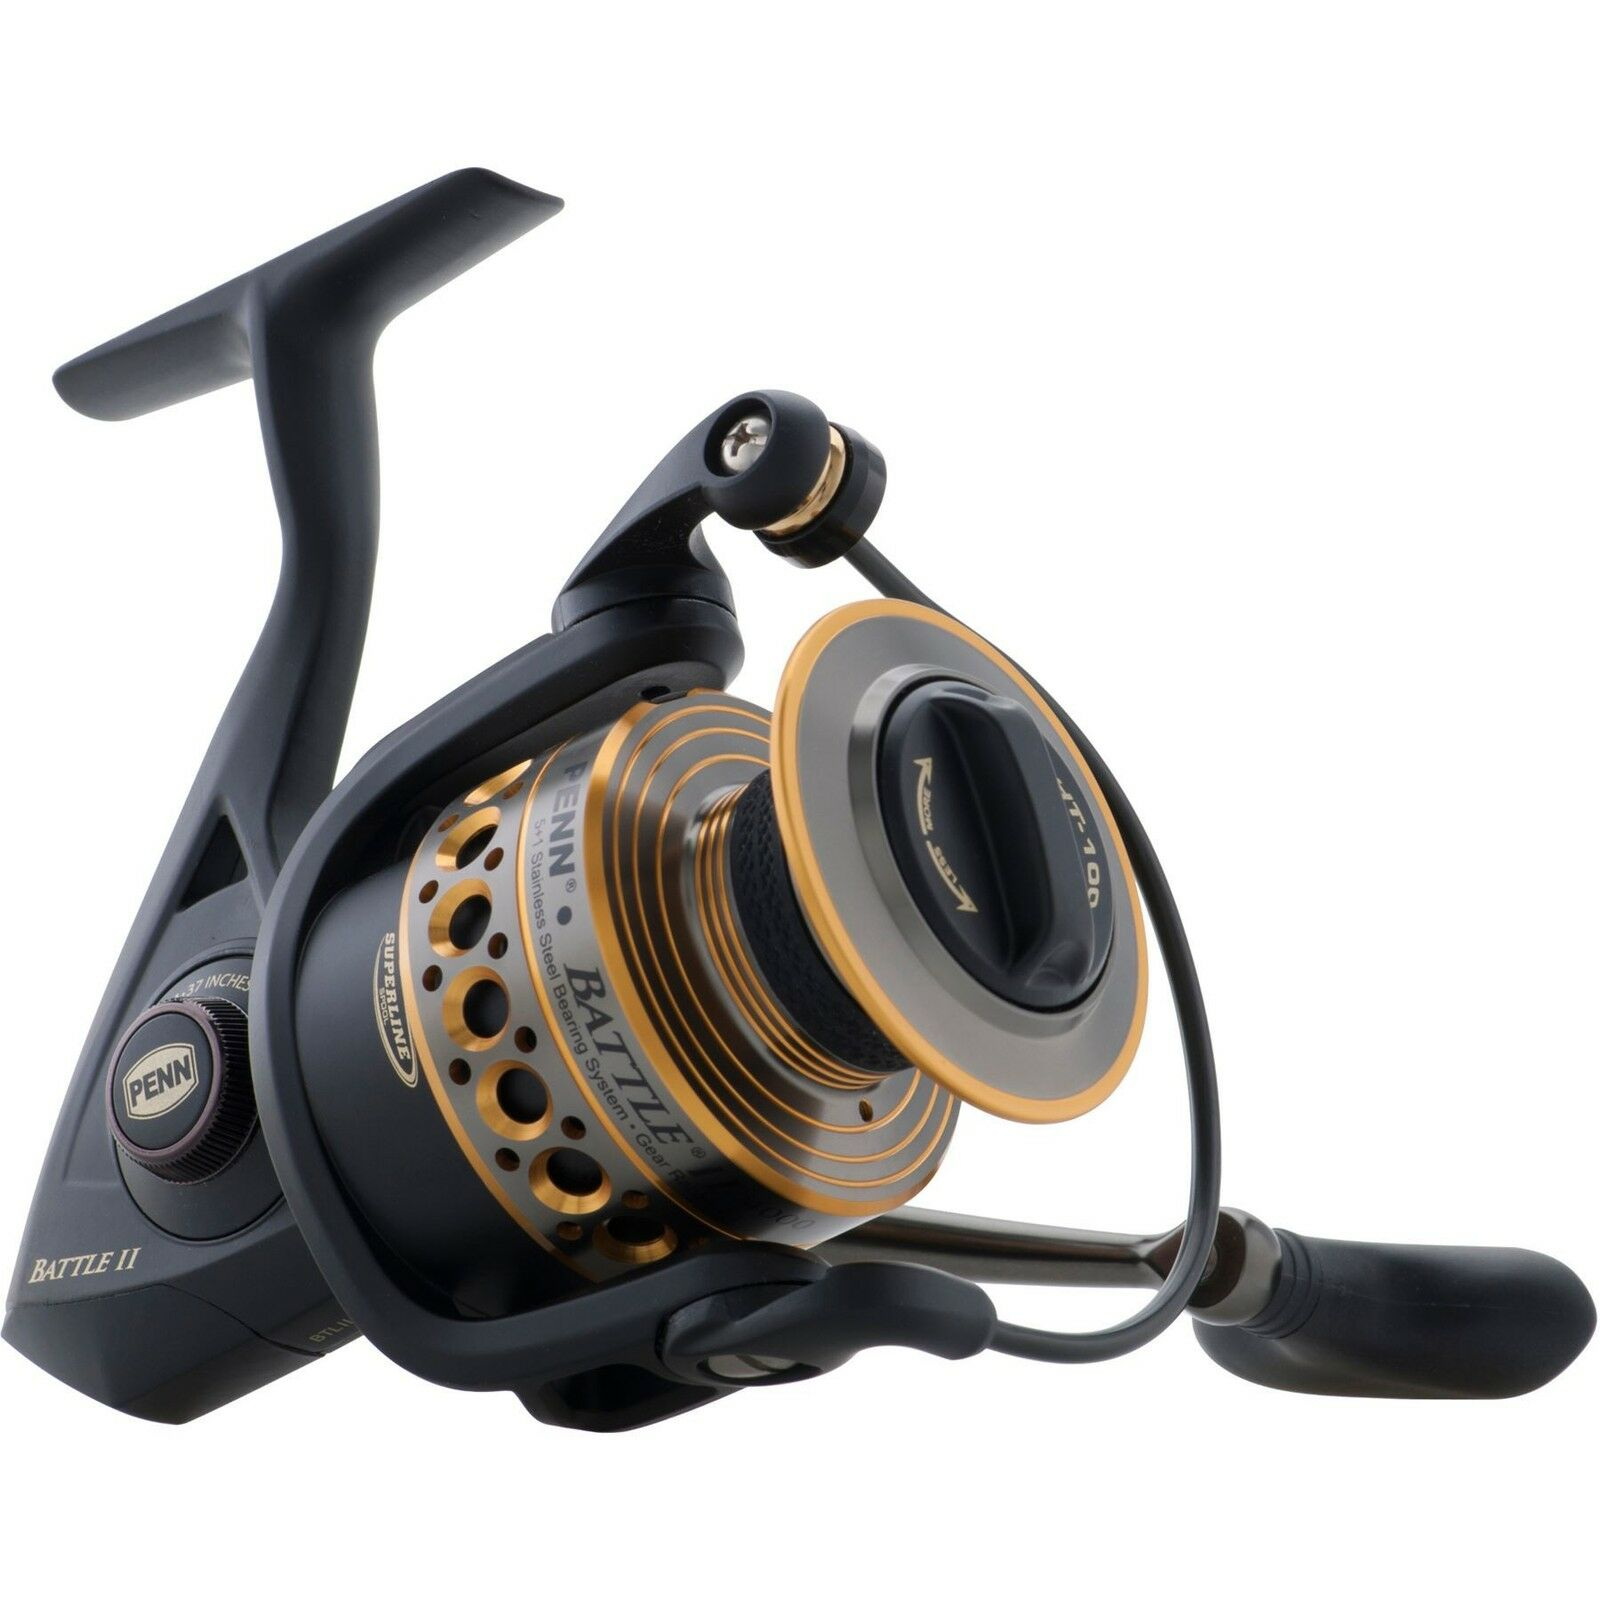 PENN Battaglia II 4000 / fishing reel / 1338219 1338219 1338219 309640